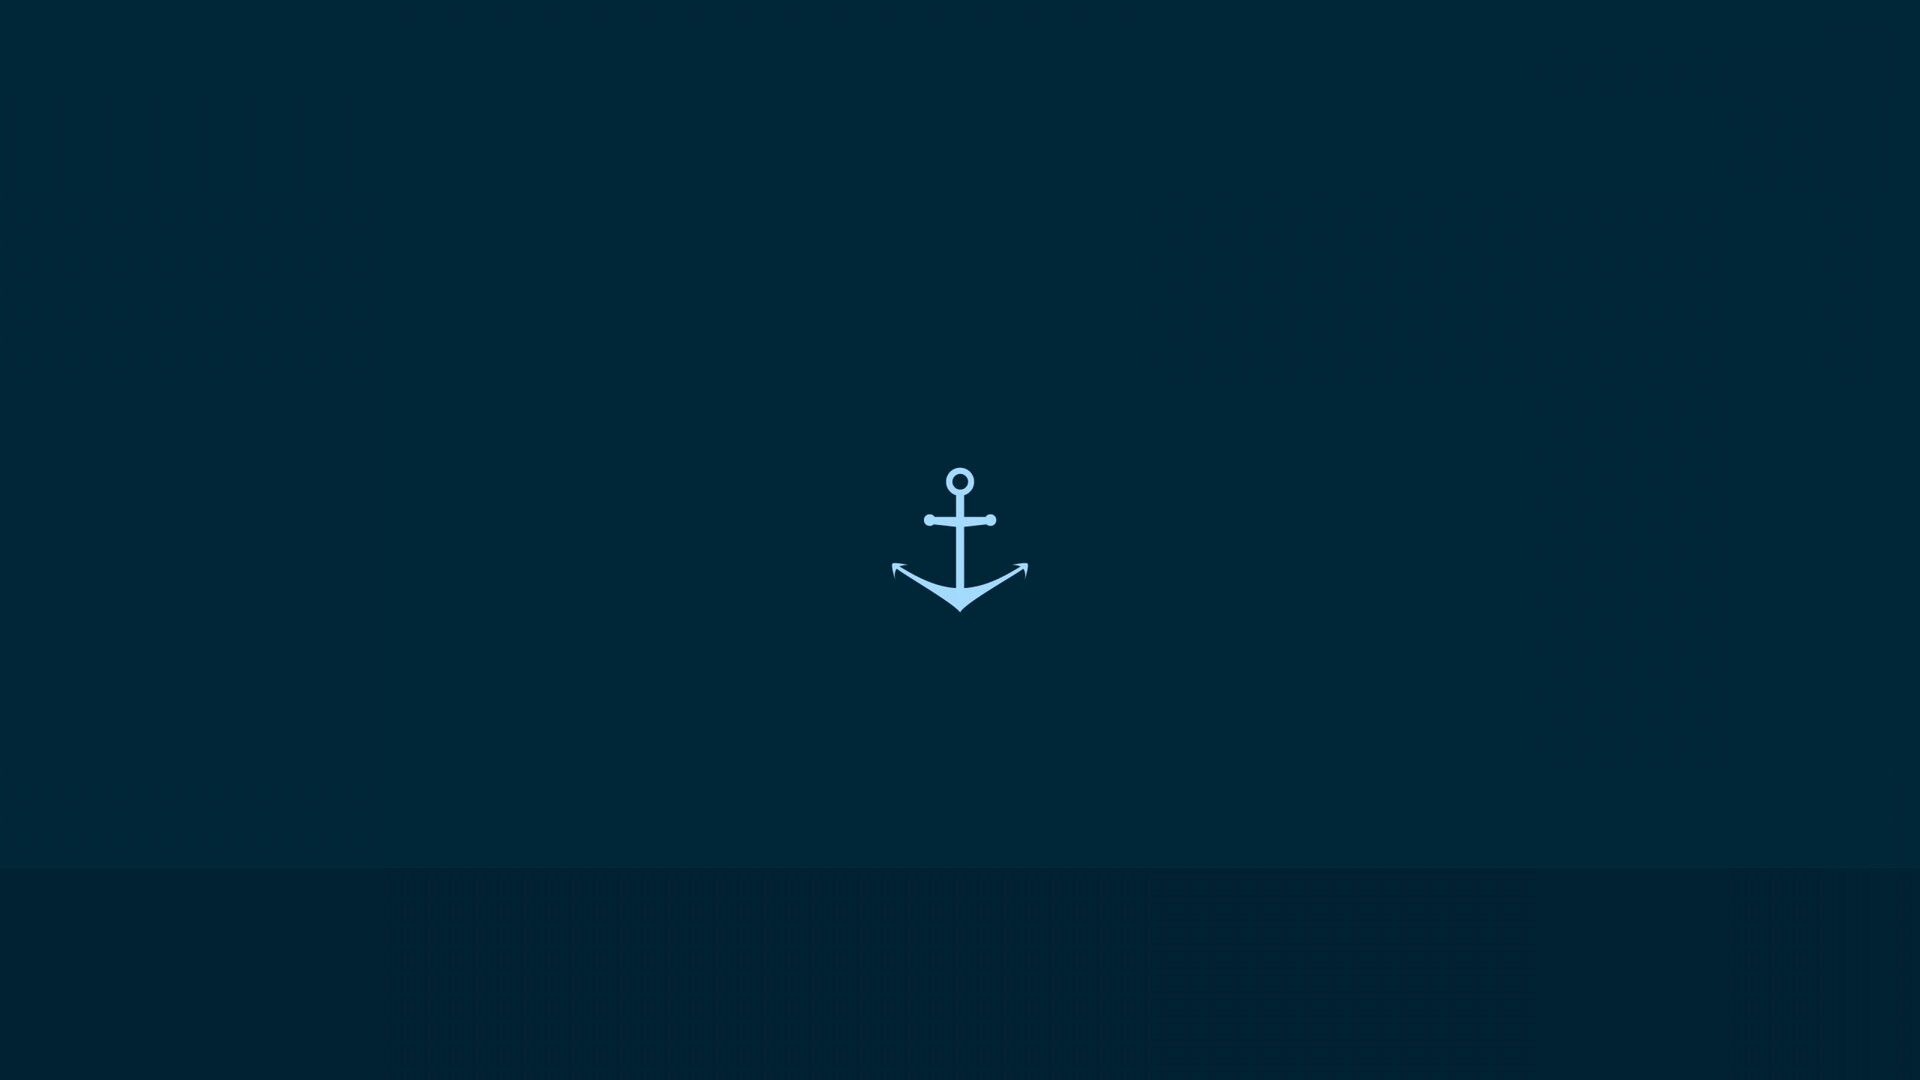 anchor-vector.jpg